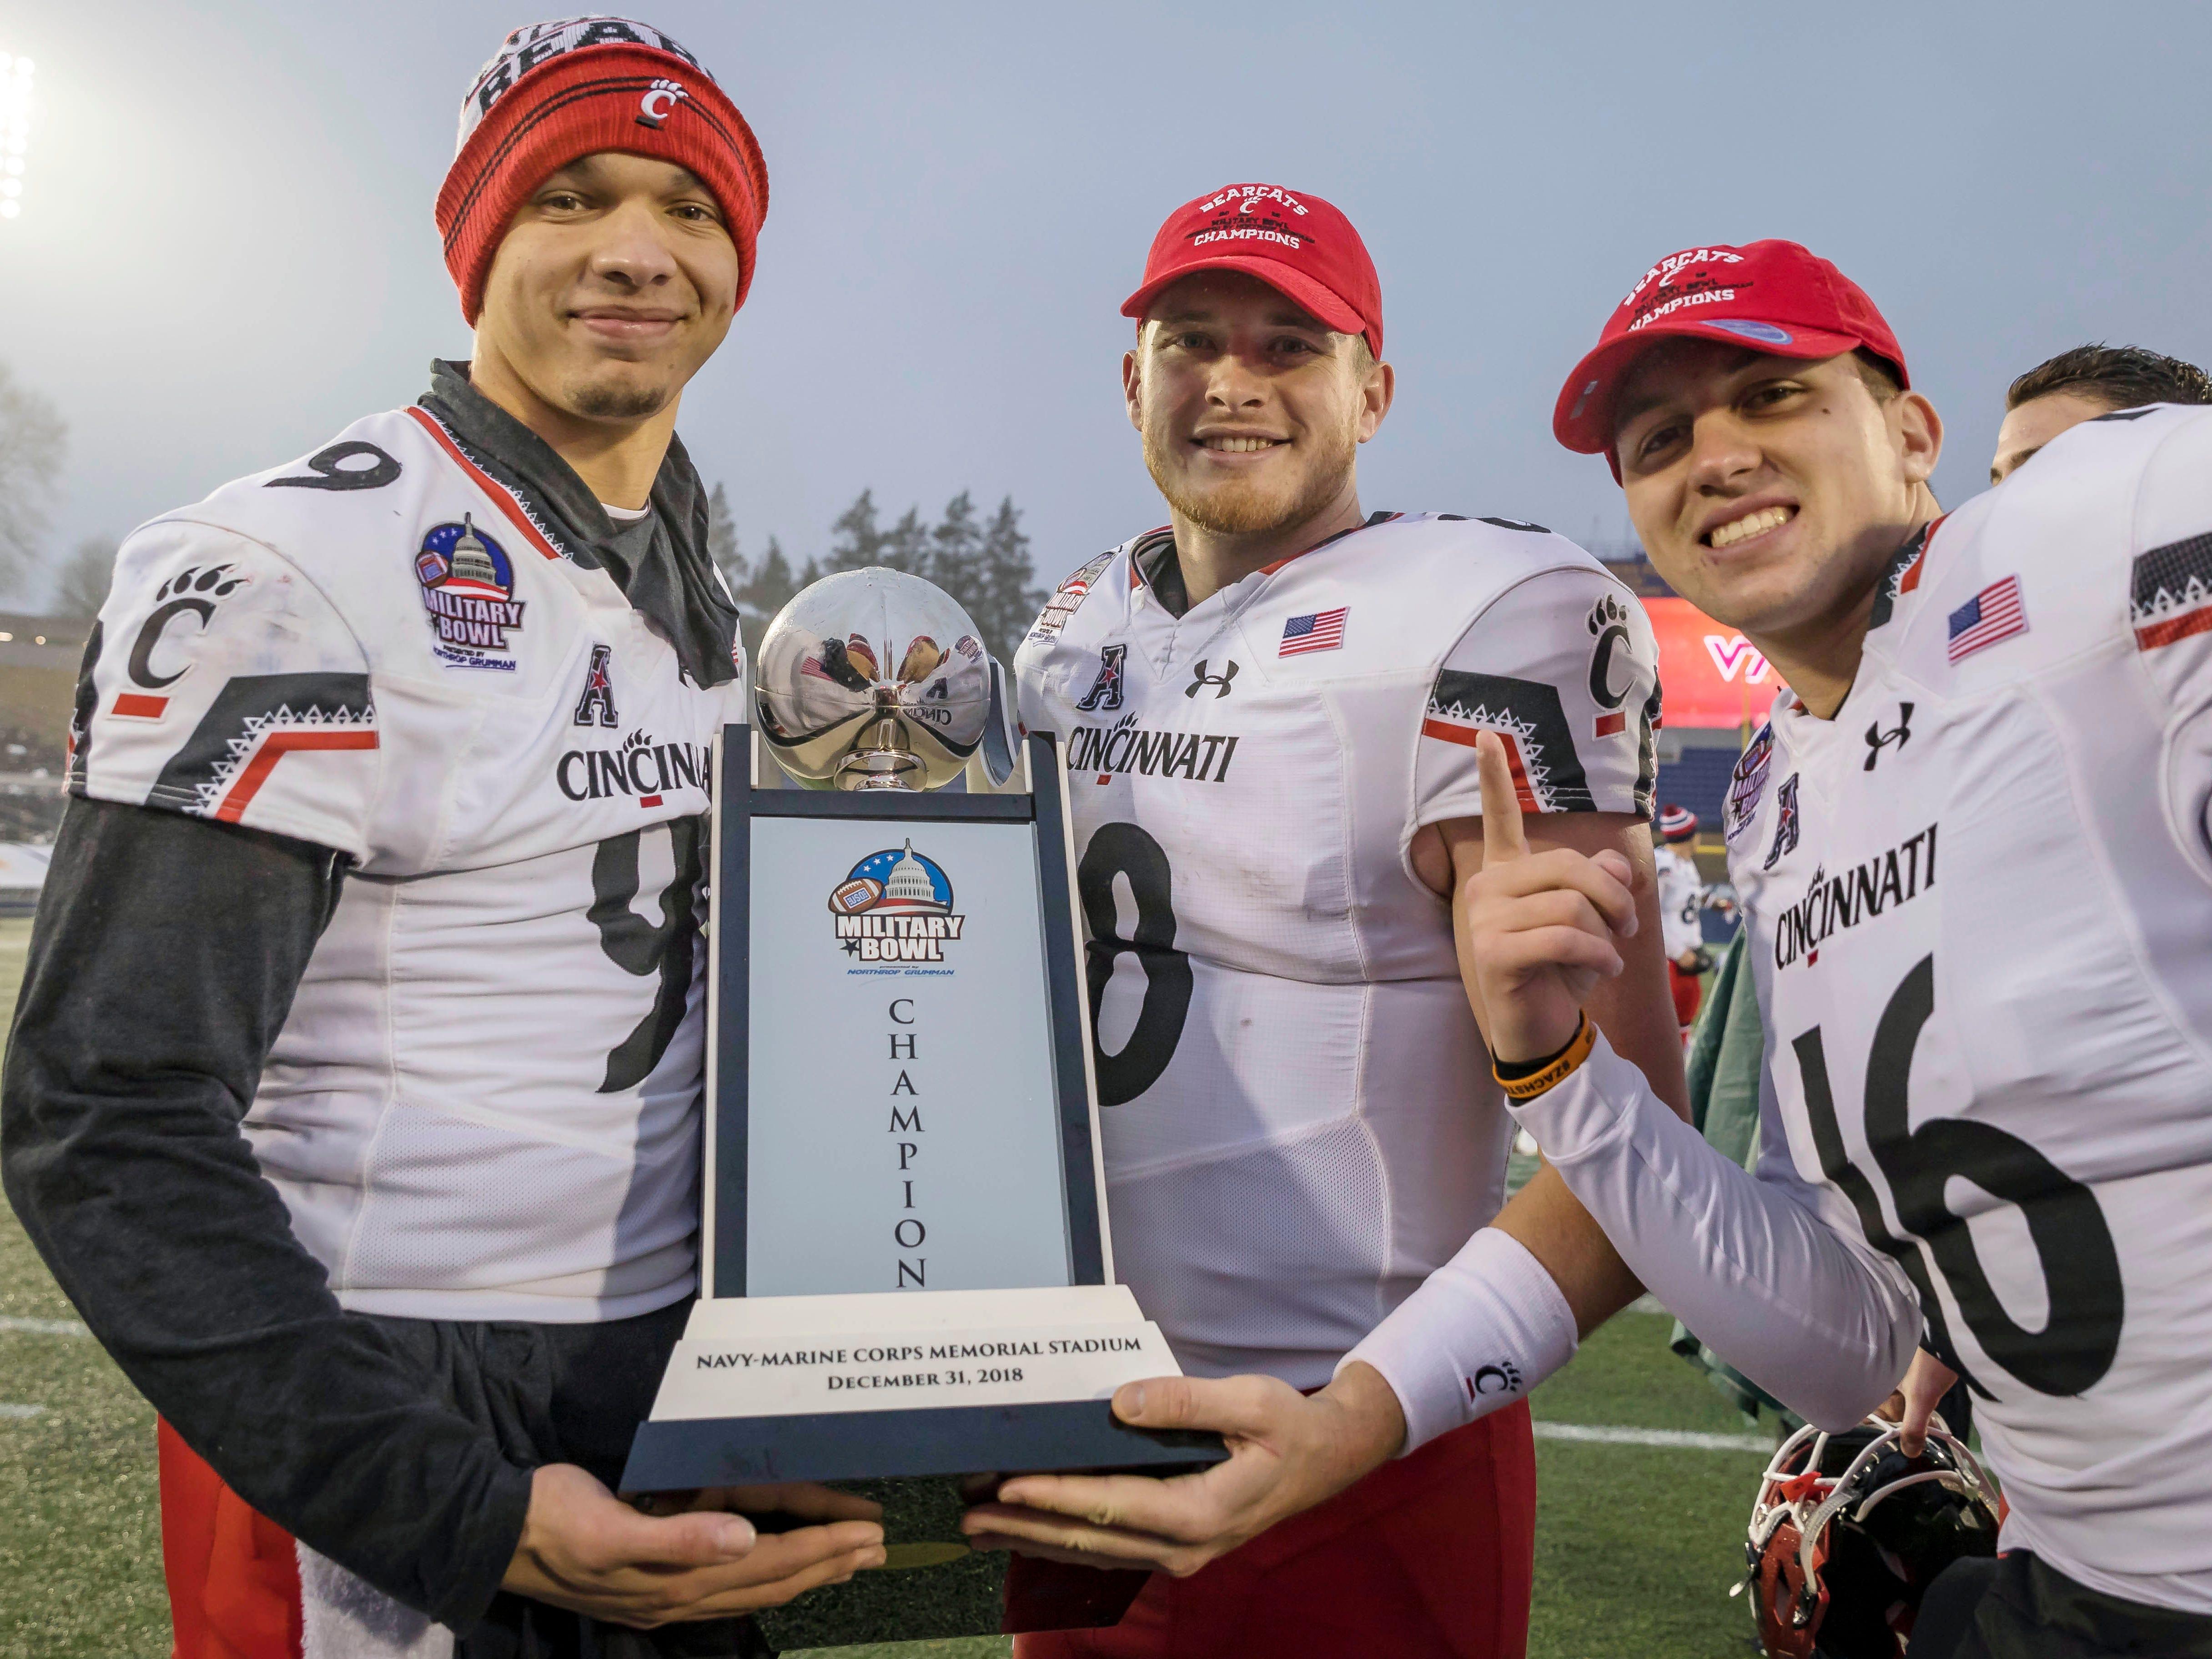 Cincinnati quarterbacks Desmond Ridder (9), Hayden Moore (8) and quarterback John Keller pose with the 2018 Military Bowl trophy after beating Virginia Tech.